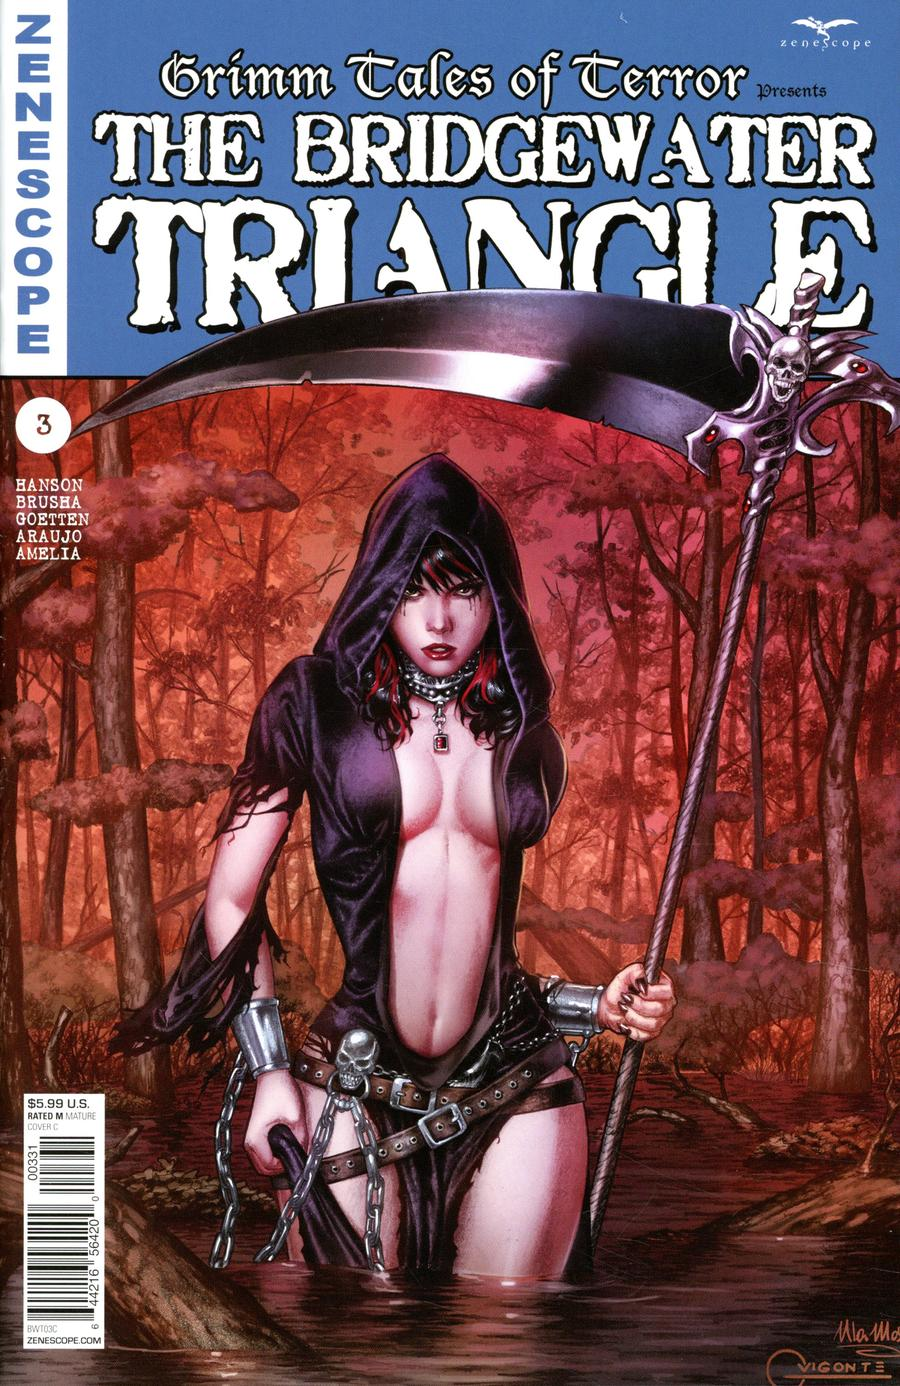 Grimm Tales Of Terror Presents Bridgewater Triangle #3 Cover C Geebo Vigonte